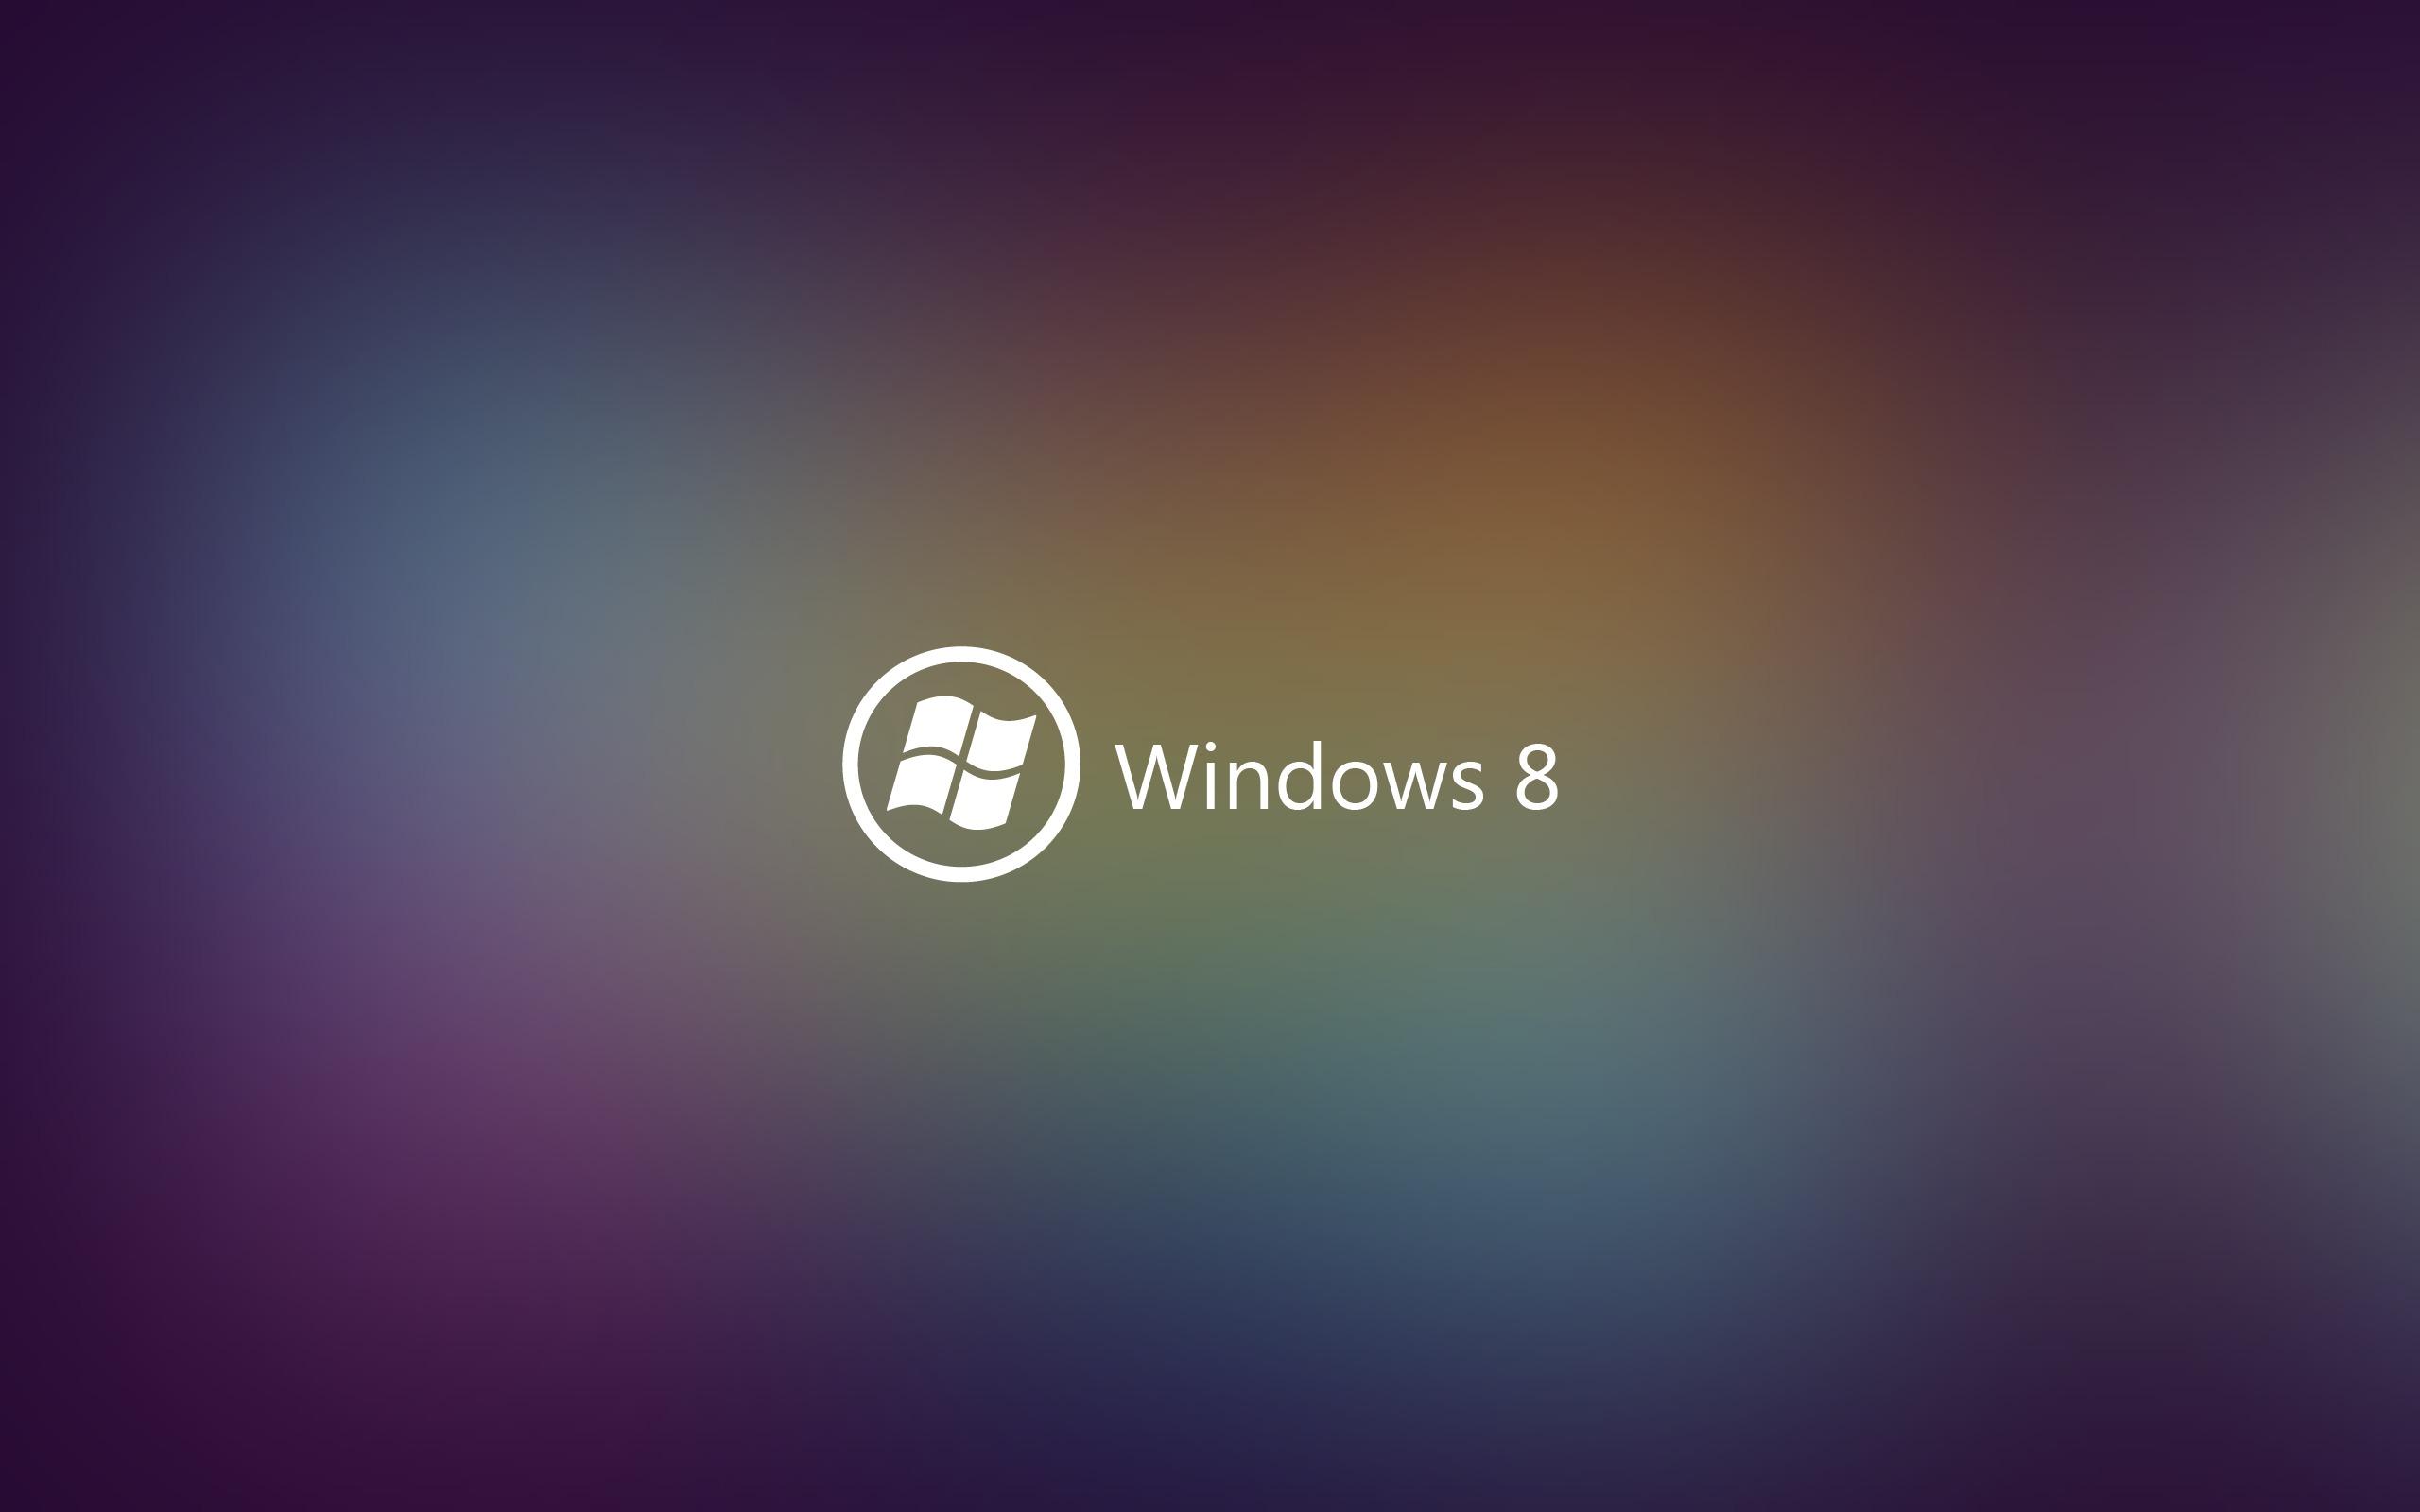 hi tech windows 8 pc pc background wallpaper wallpapersjpg 2560x1600